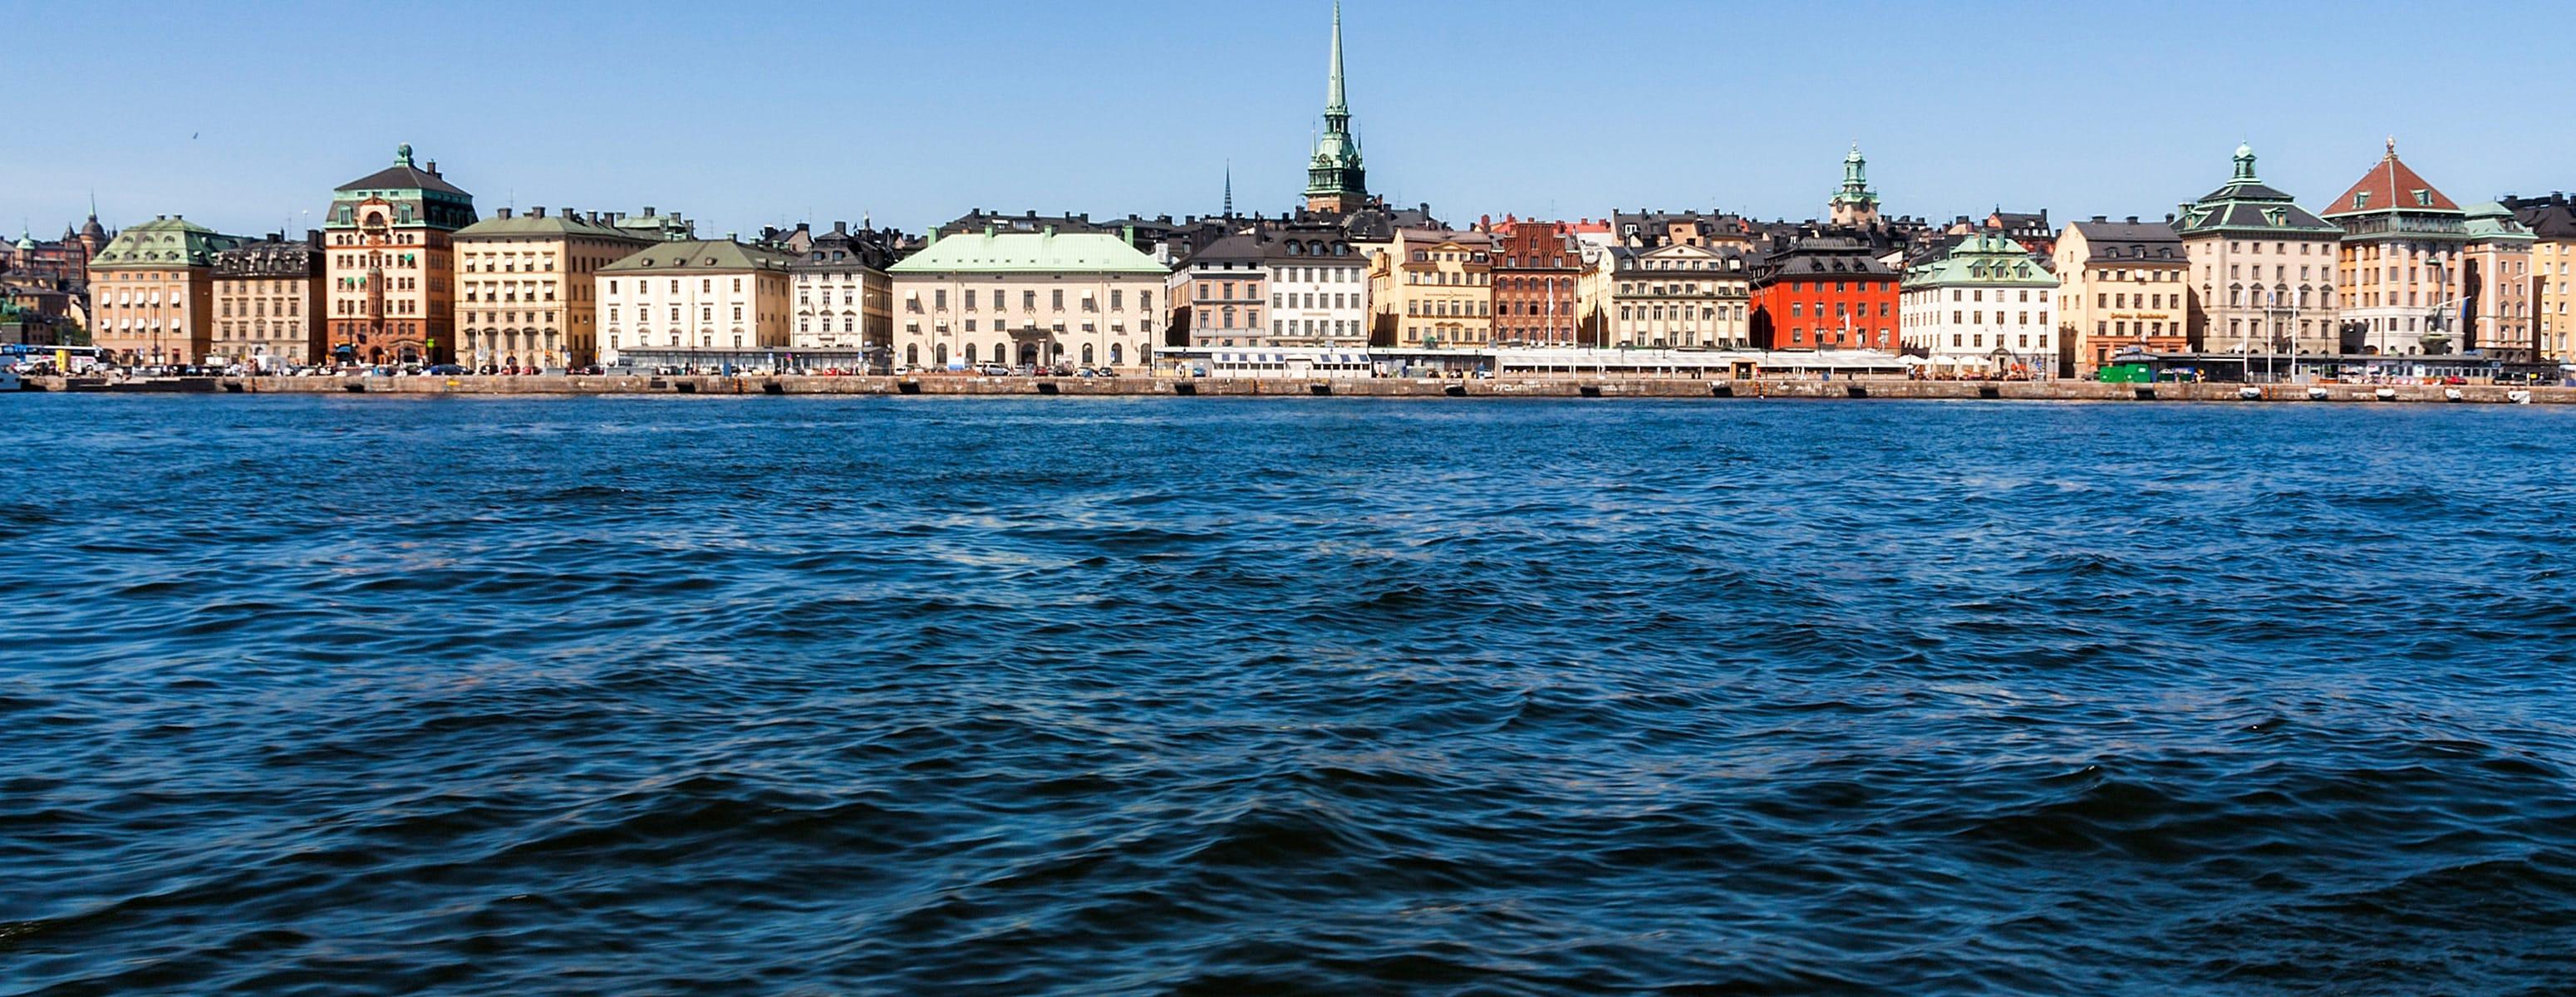 stockholm city escorts happy hour stockholm